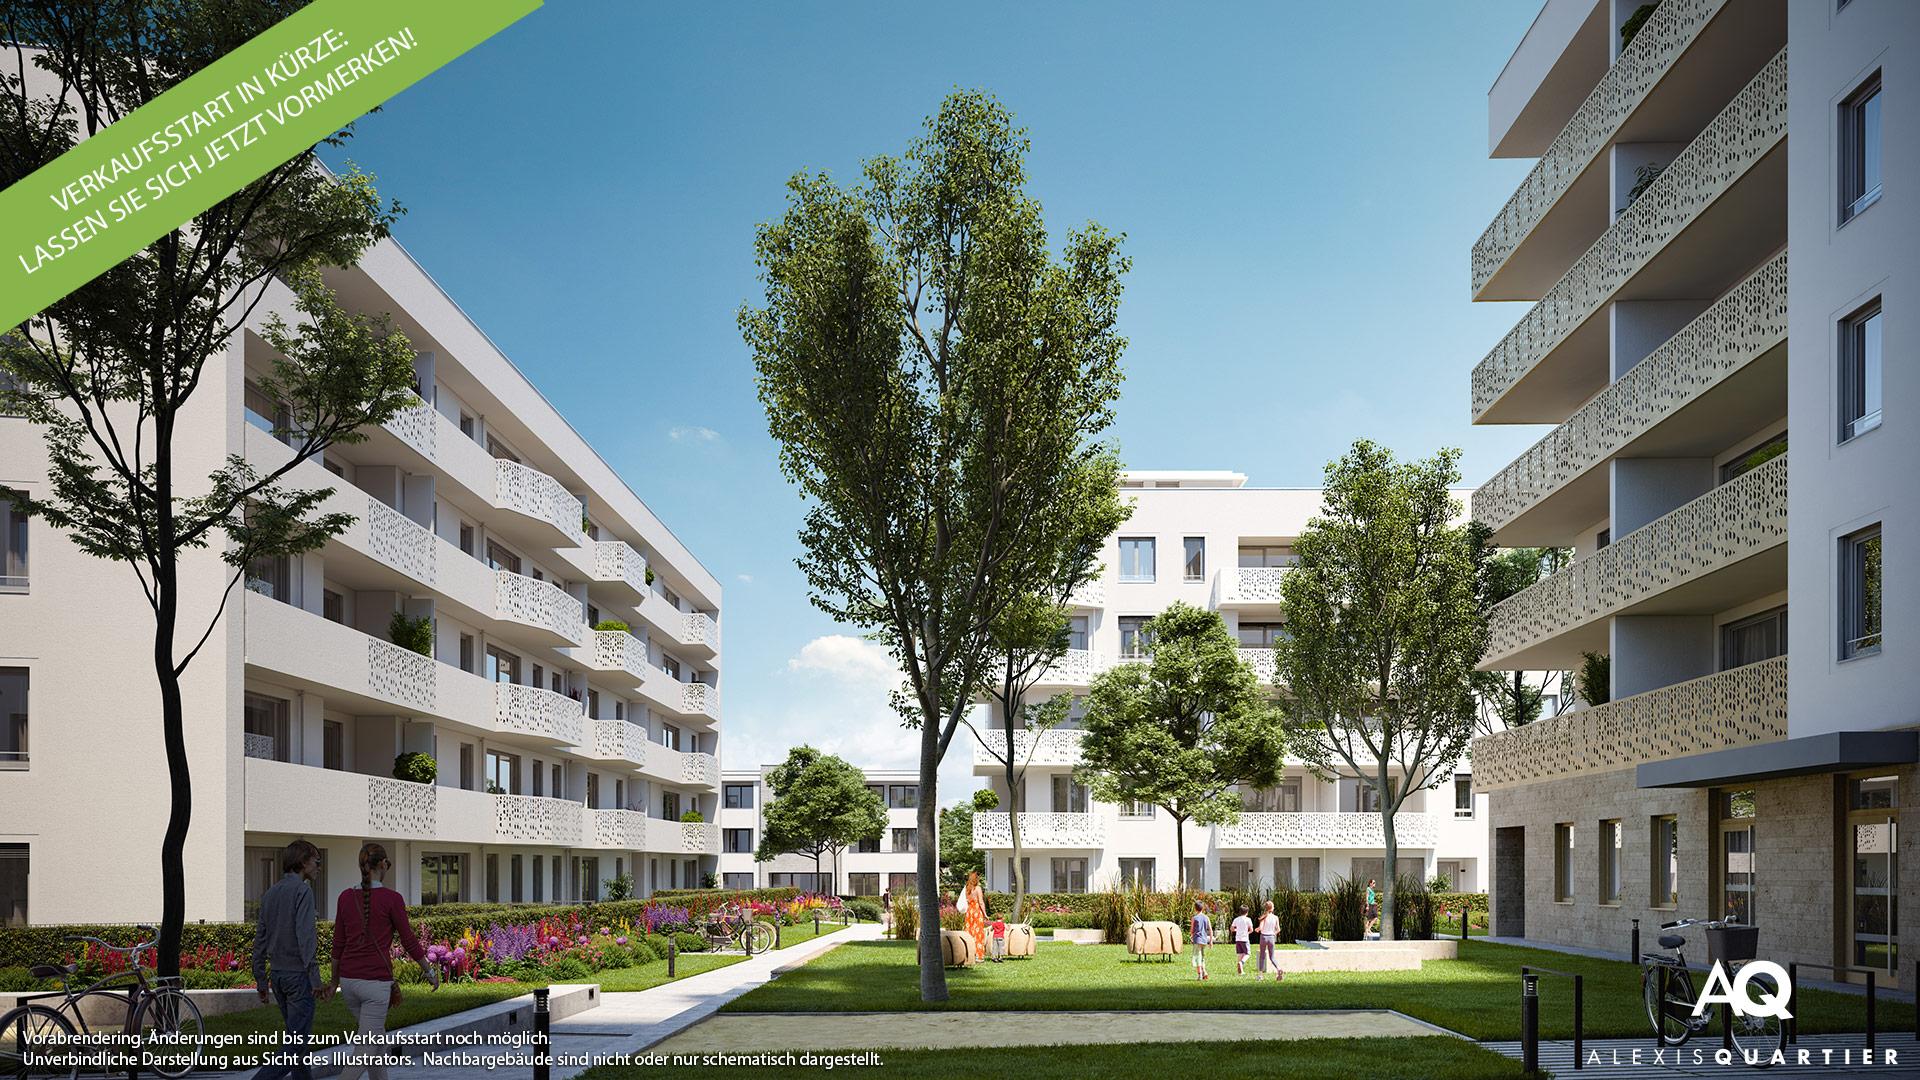 Property Alexisquartier - Vorabillustration 2